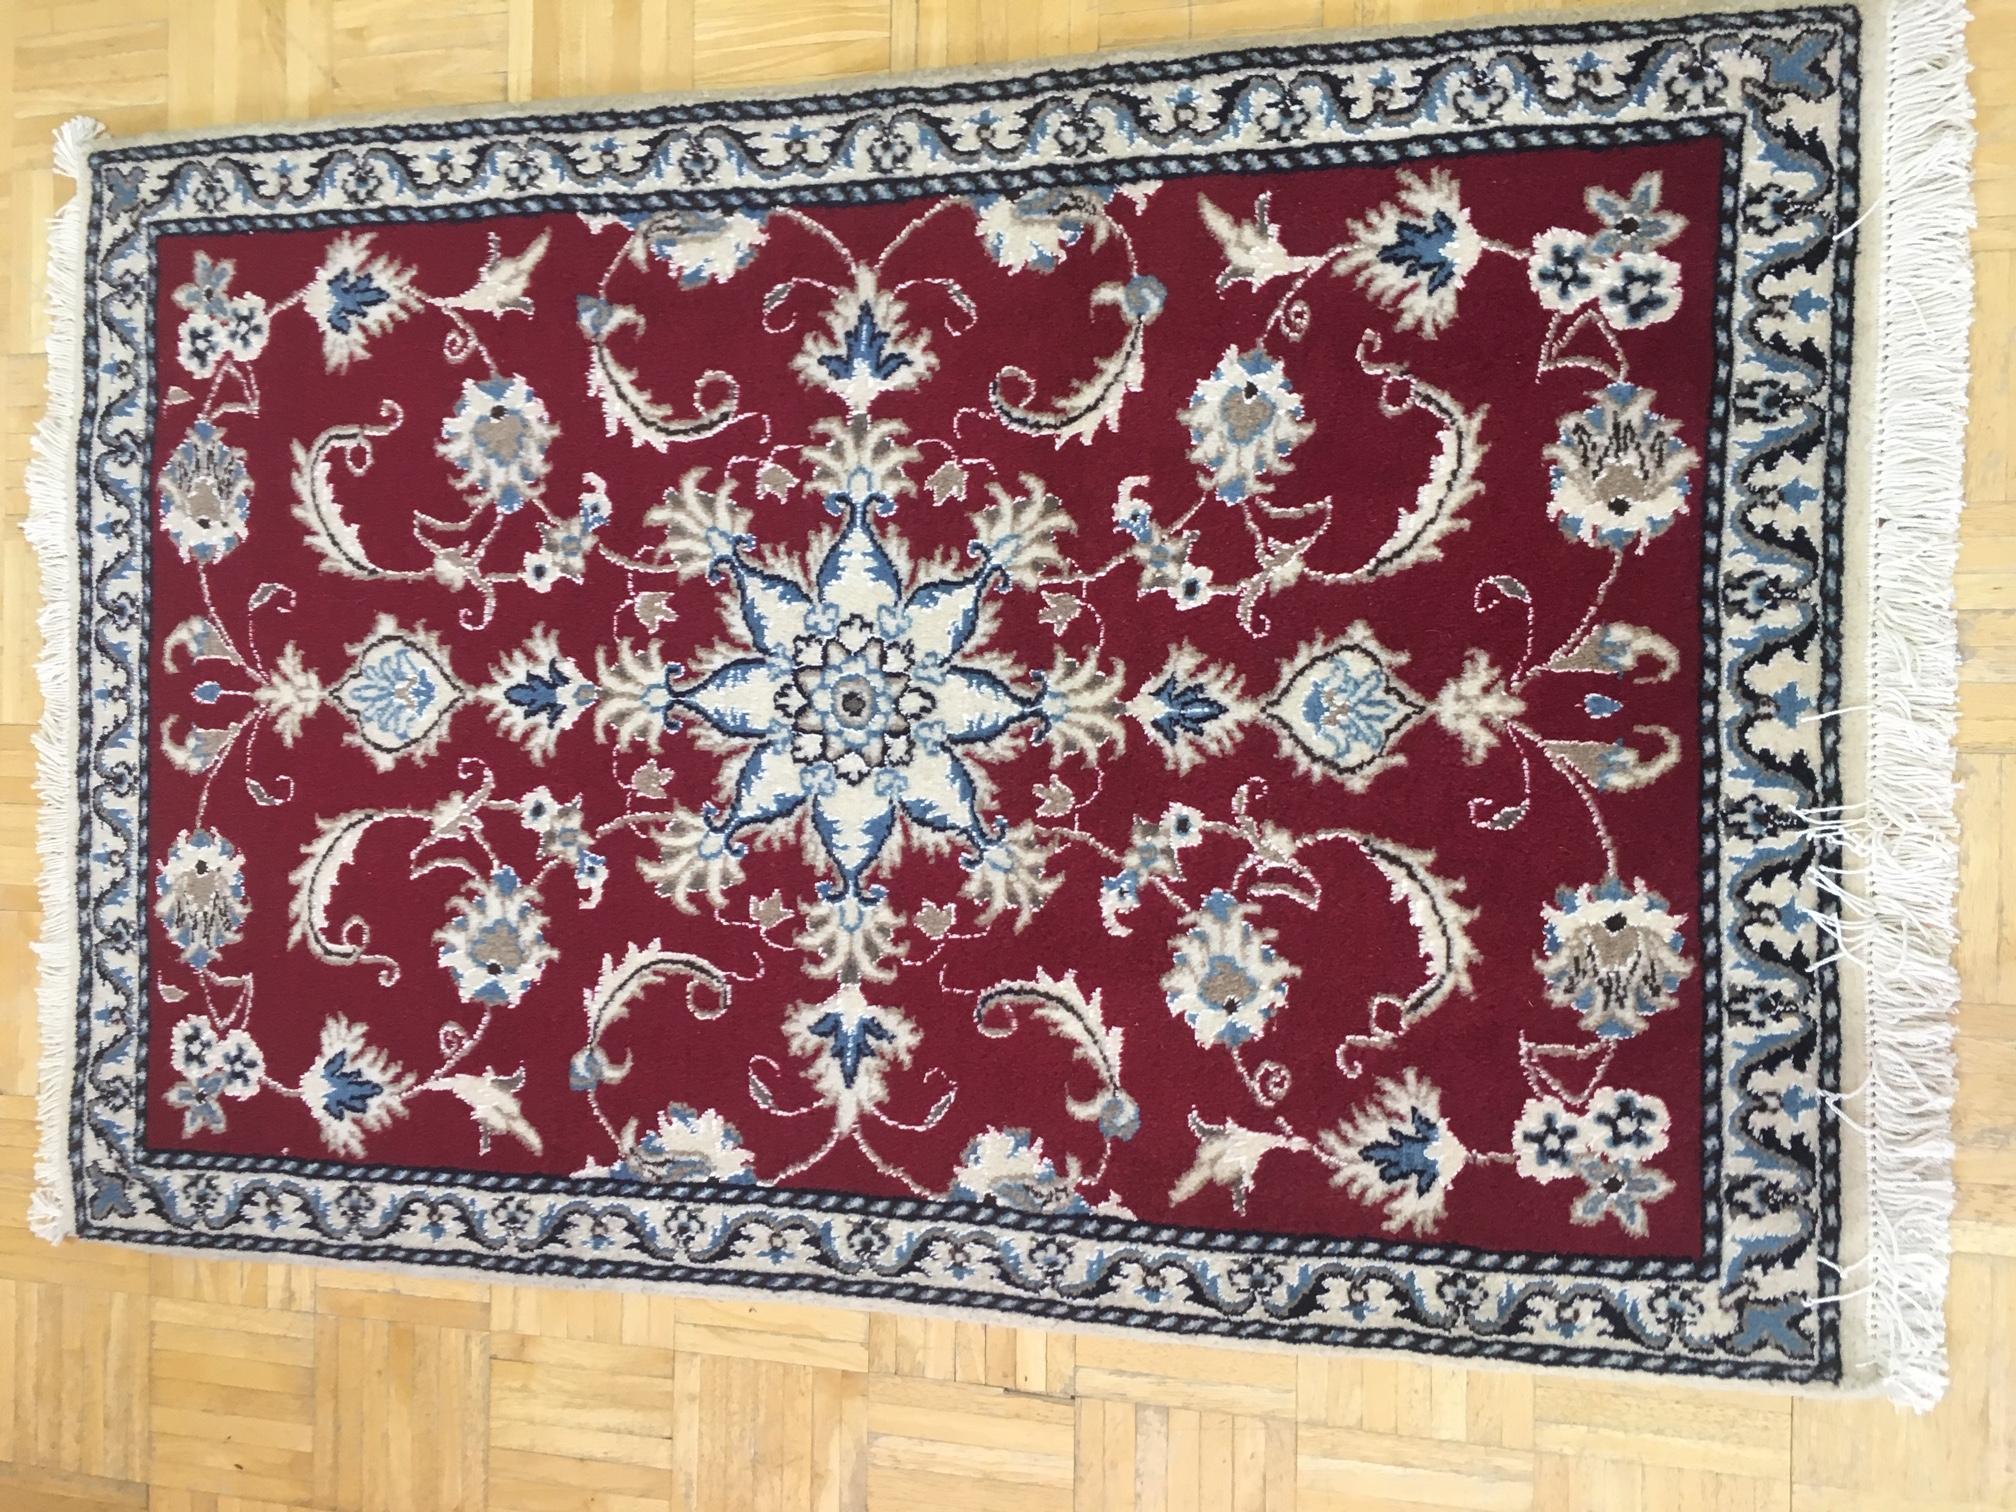 151 - 3 x 4.5 - Afshon - Wool - Iran